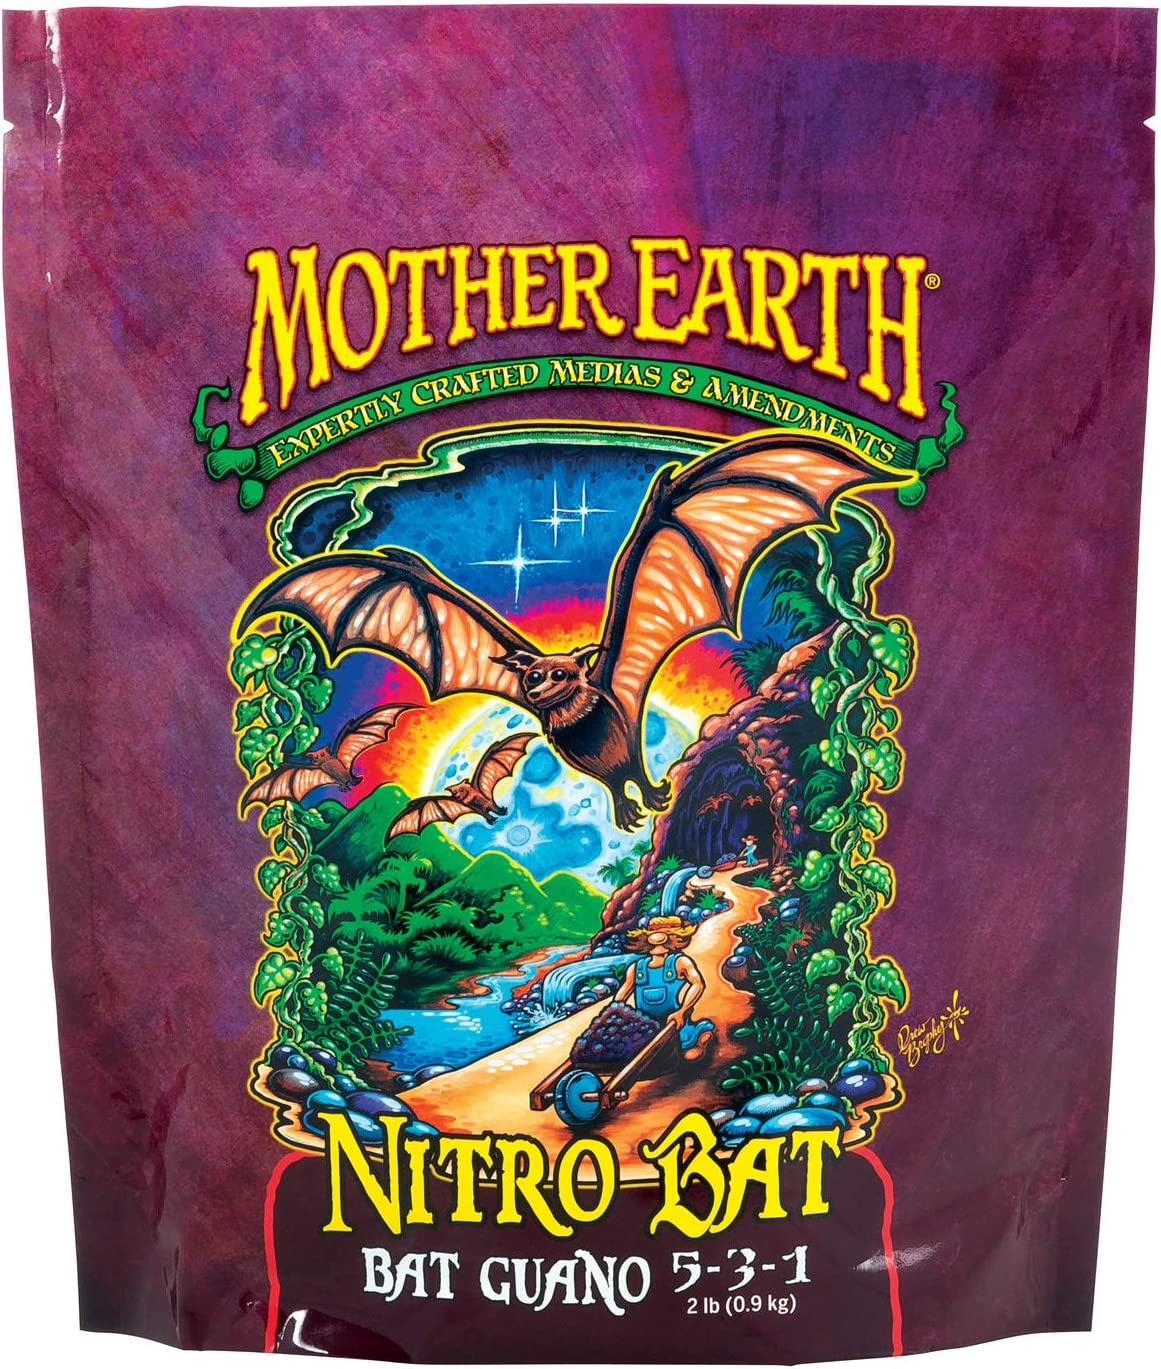 Mother Earth HGC733955 Nitro Bat Bat Guano 5-3-1 Plant Fertilizer For Vegetative Plants, Flowers And Tomatoes, 2 lbs.